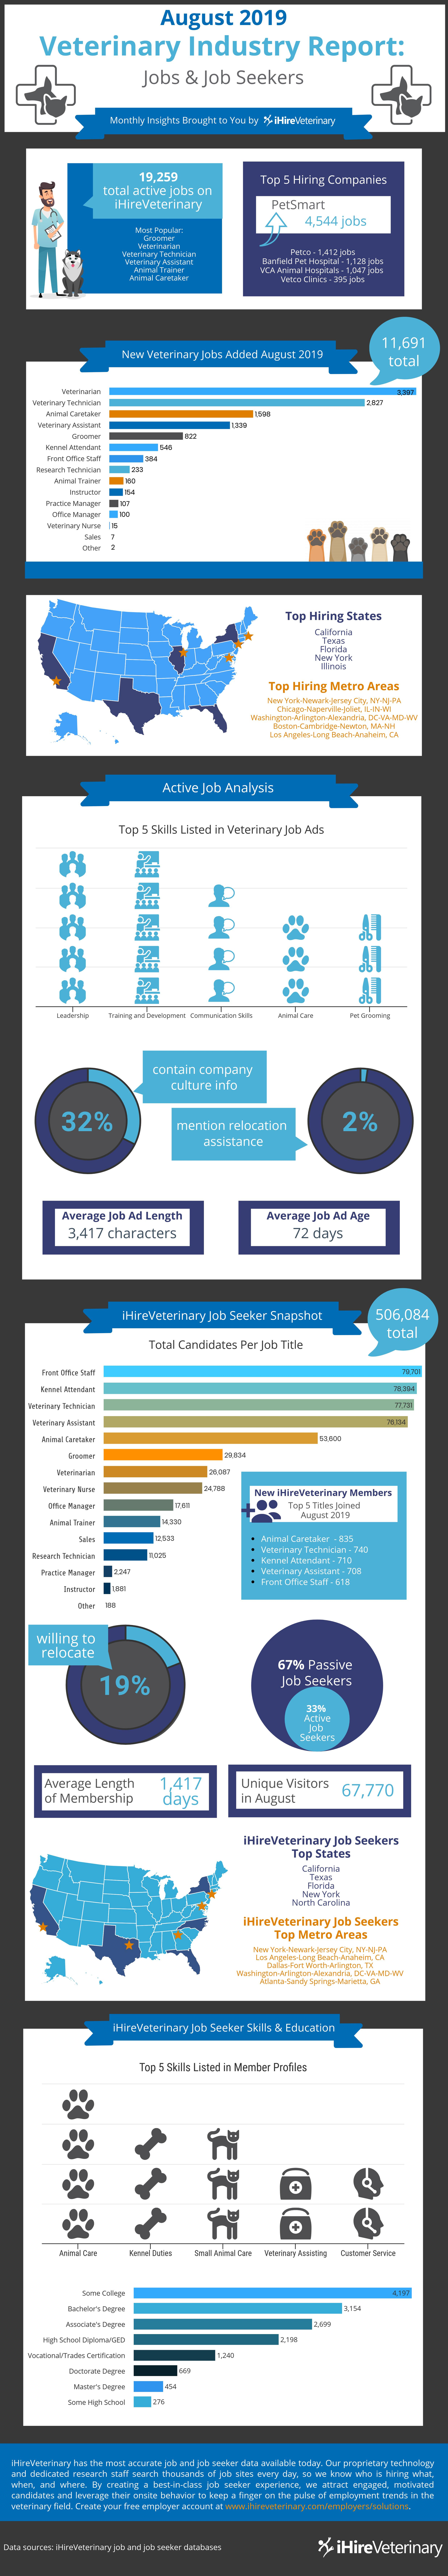 ihireveterinary august 2019 veterinary industry infographic